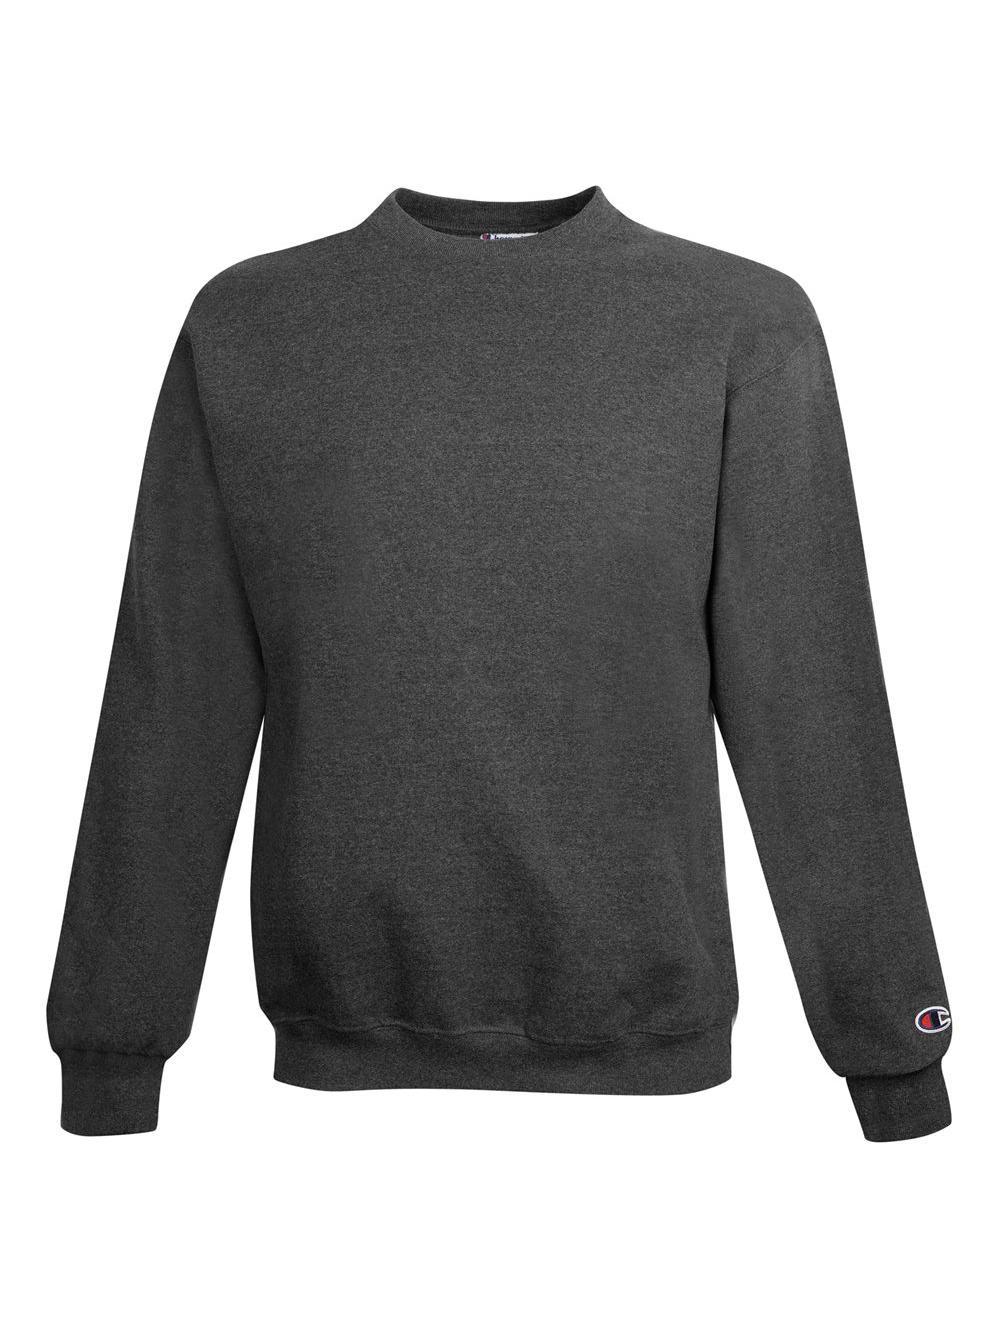 Champion-Double-Dry-Eco-Crewneck-Sweatshirt-S600 thumbnail 6